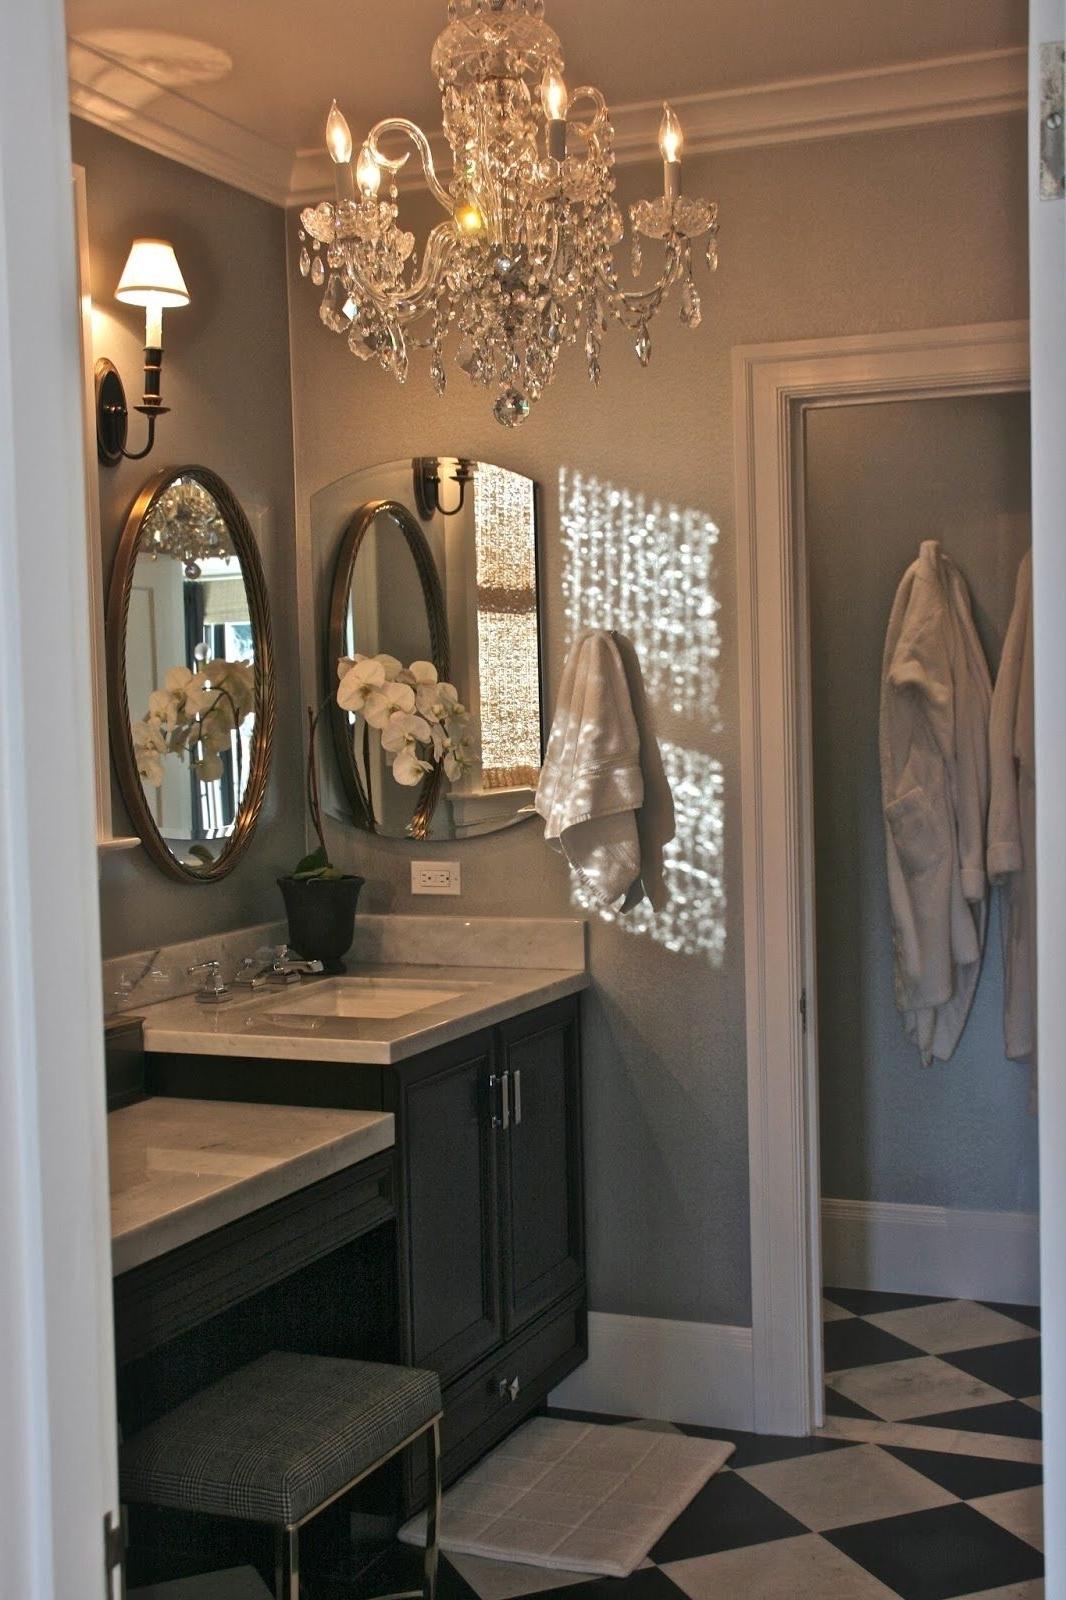 Chandelier Bathroom Lighting In Widely Used Elegant Retreat. .  (View 3 of 15)